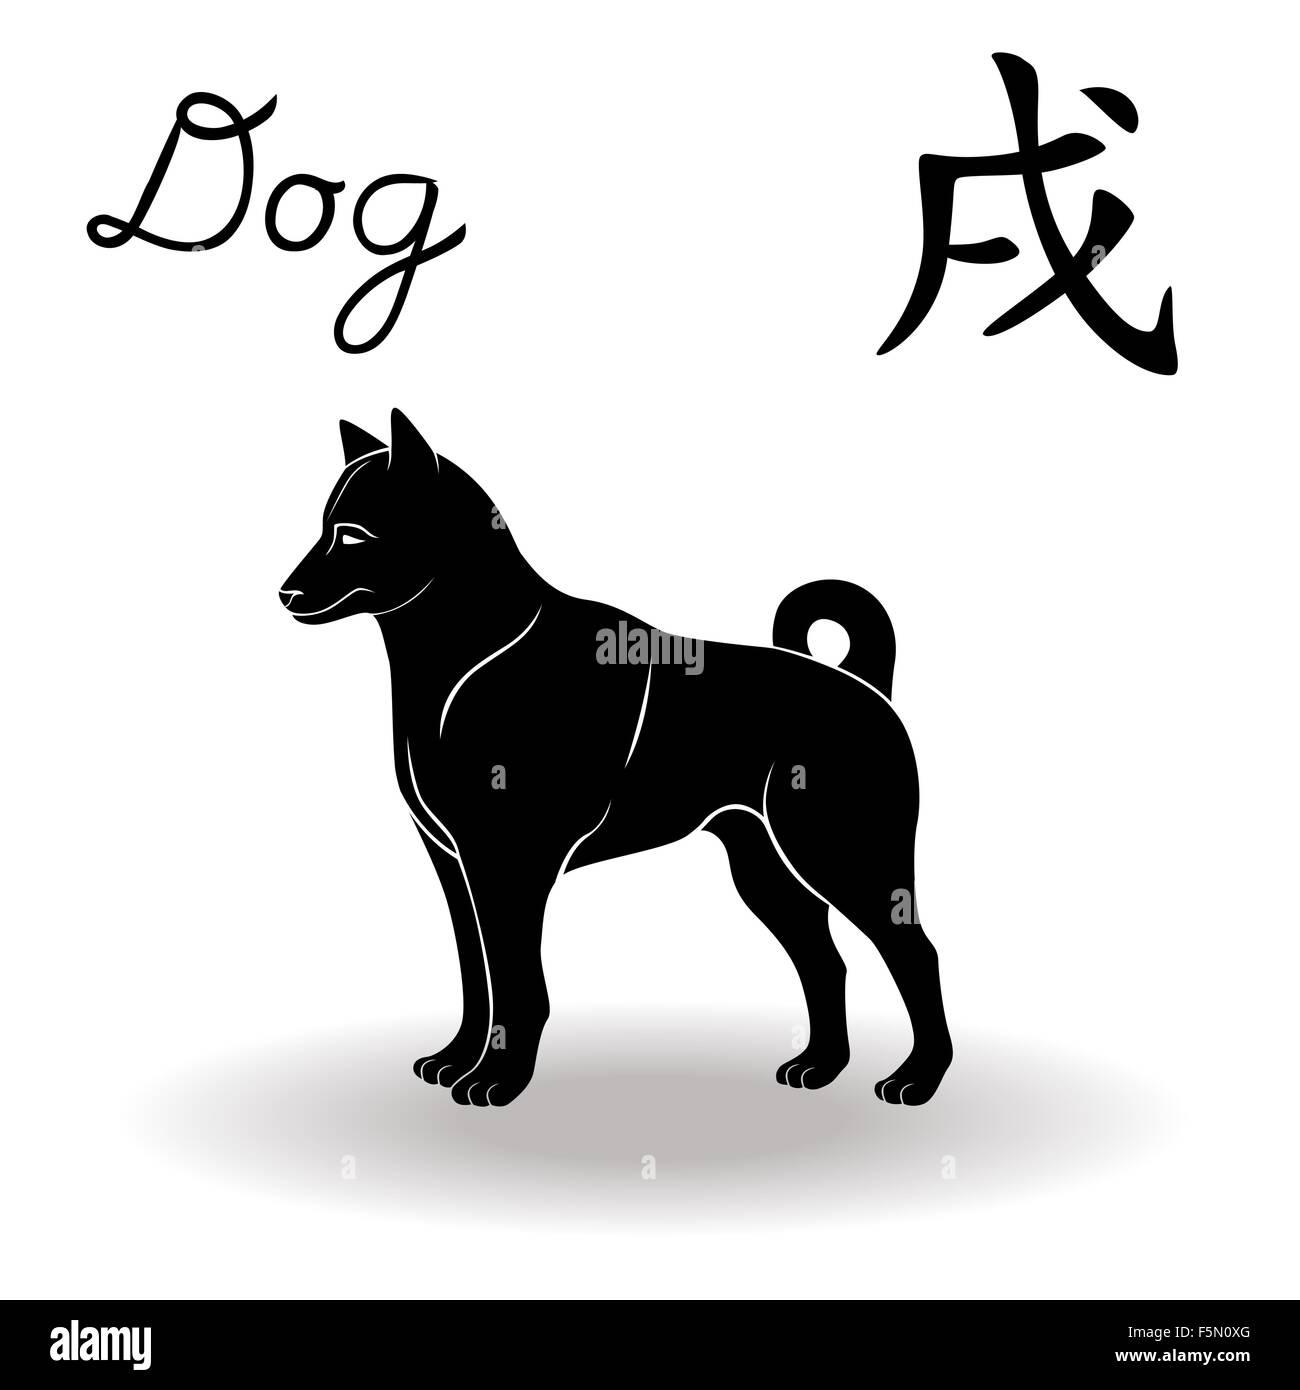 Chinese zodiac sign dog fixed element earth symbol of new year on chinese zodiac sign dog fixed element earth symbol of new year on the chinese calendar hand drawn black vector stencil isolat buycottarizona Gallery